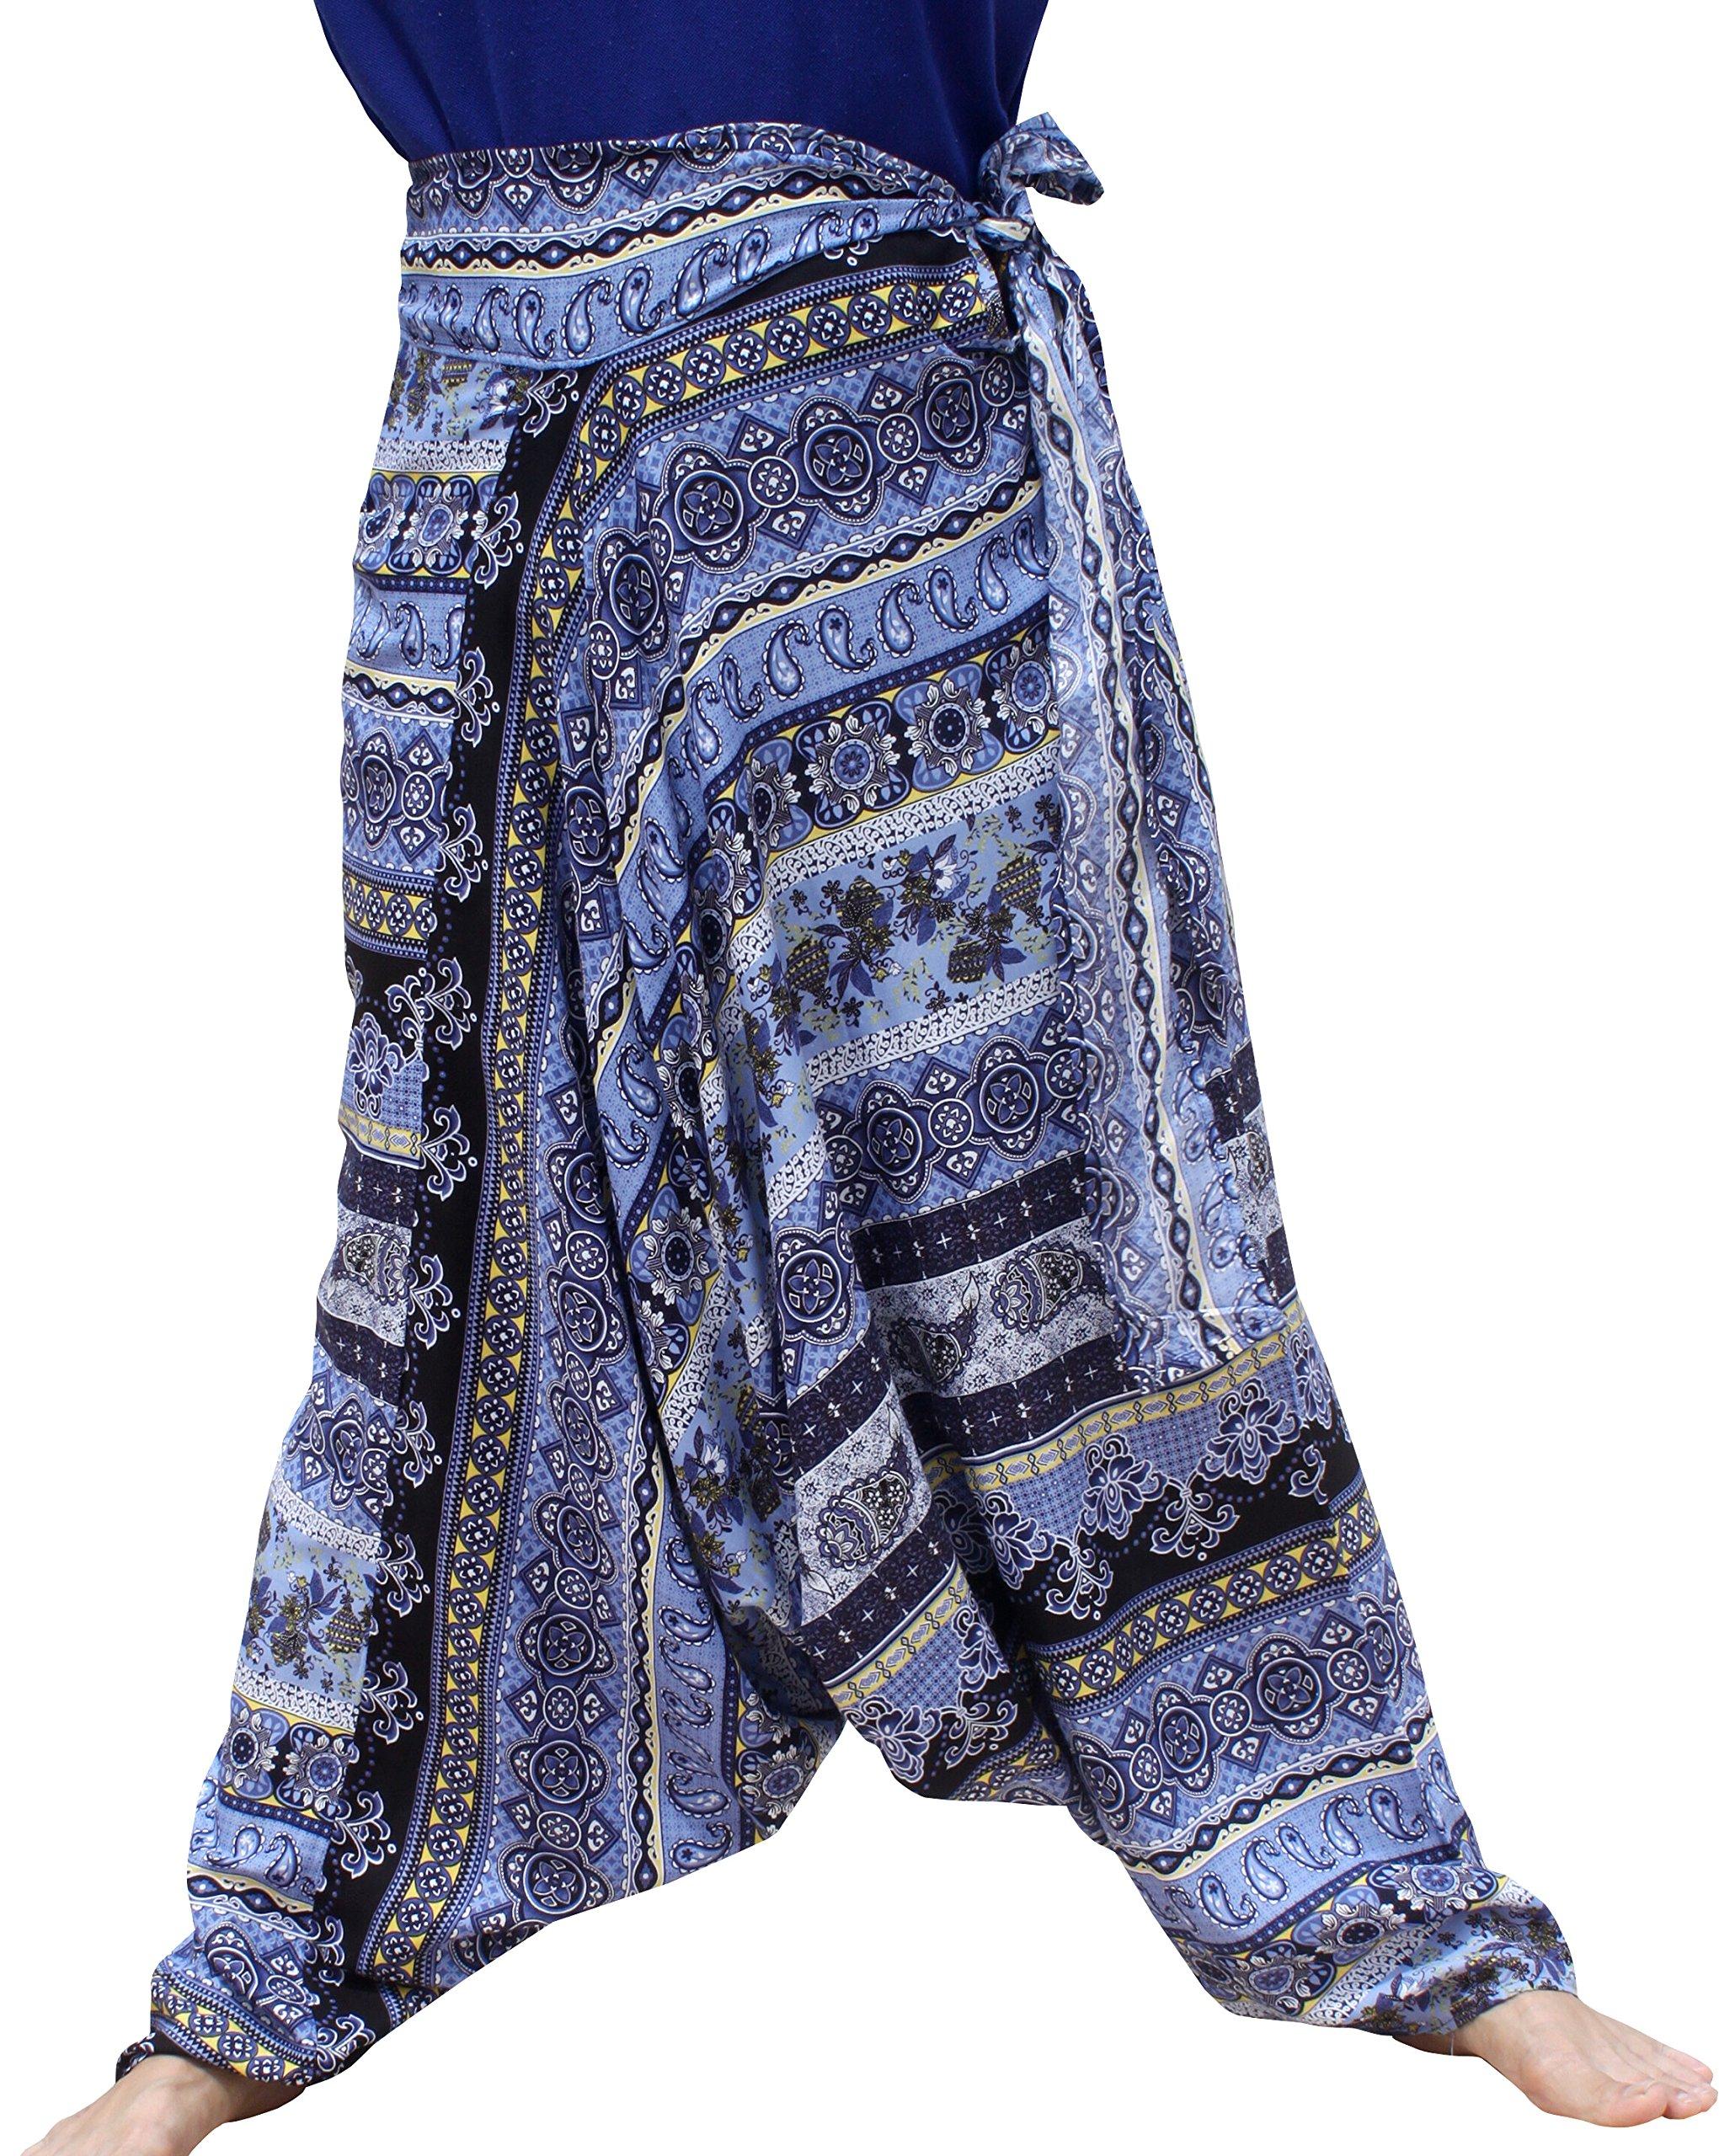 Raan Pah Muang Mixed Art Baggy Side Tie Mao Hmong Hill Tribe Harem Pants, Small, Paisley - Dark Blue by Raan Pah Muang